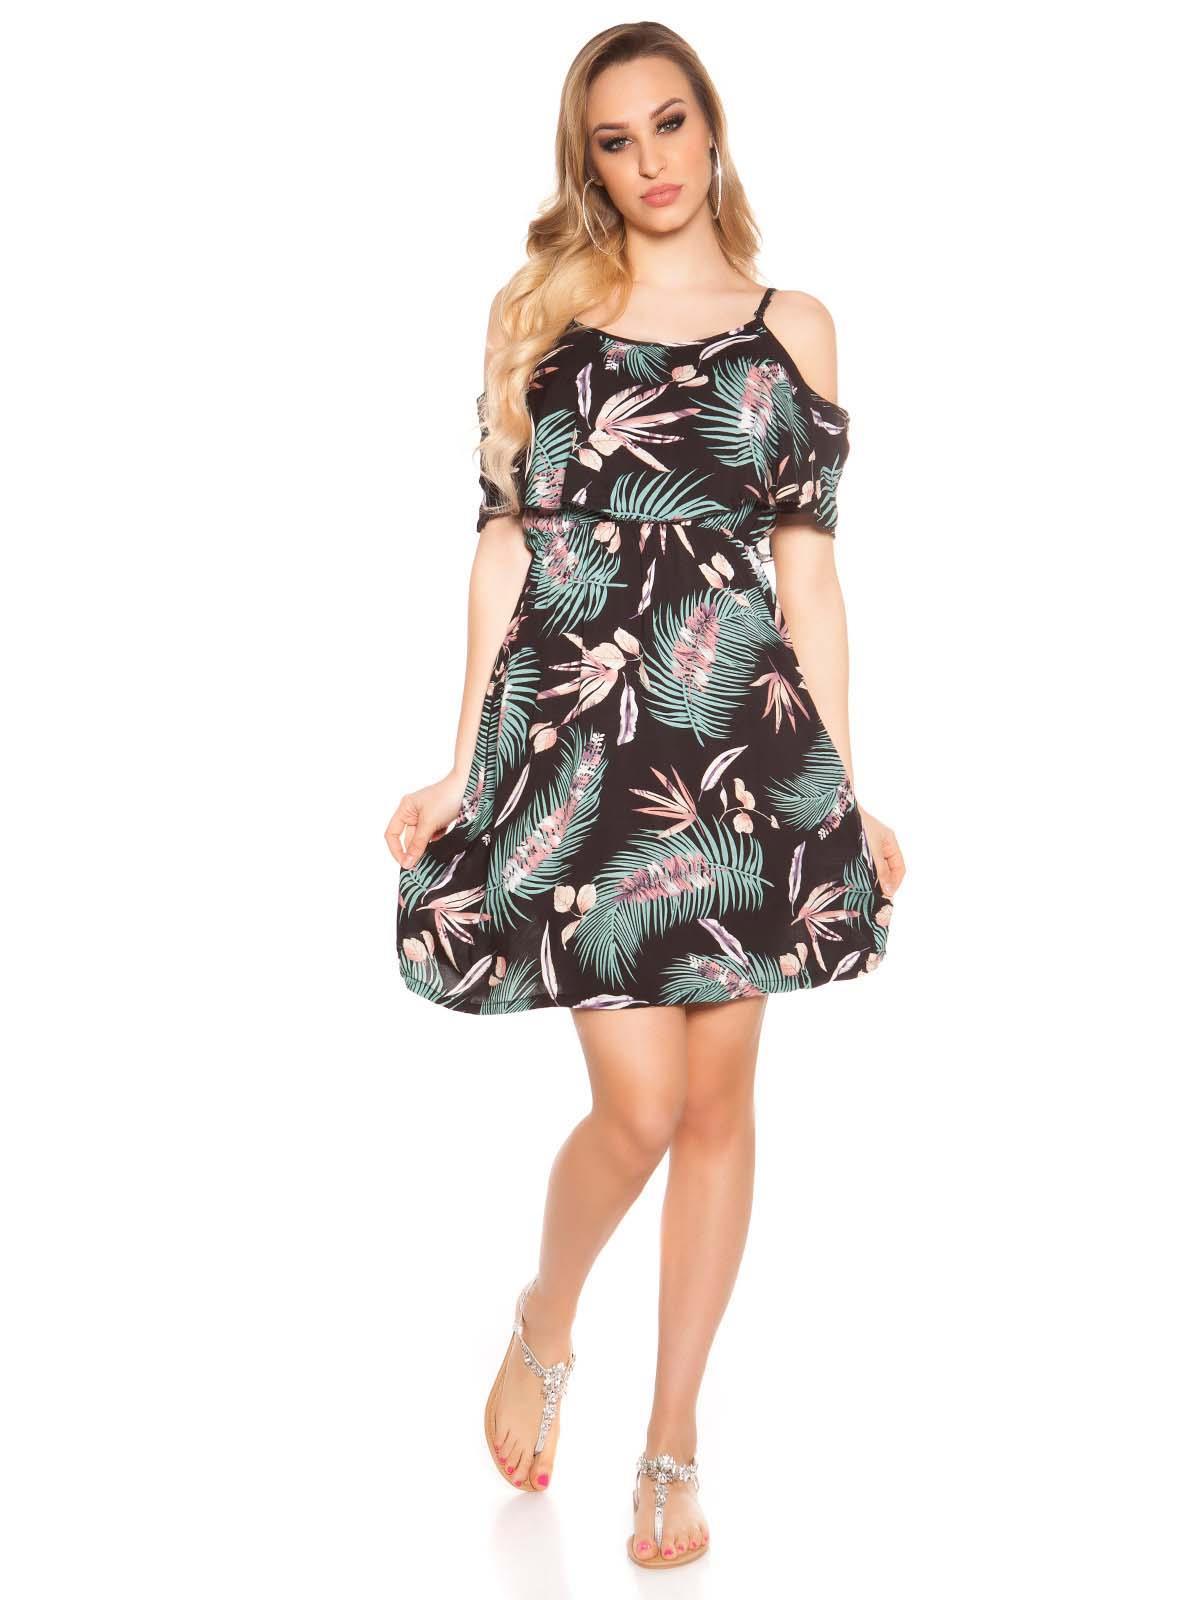 KOUCLA Vestito corto floreale 0000C1802 9d0aad387b6